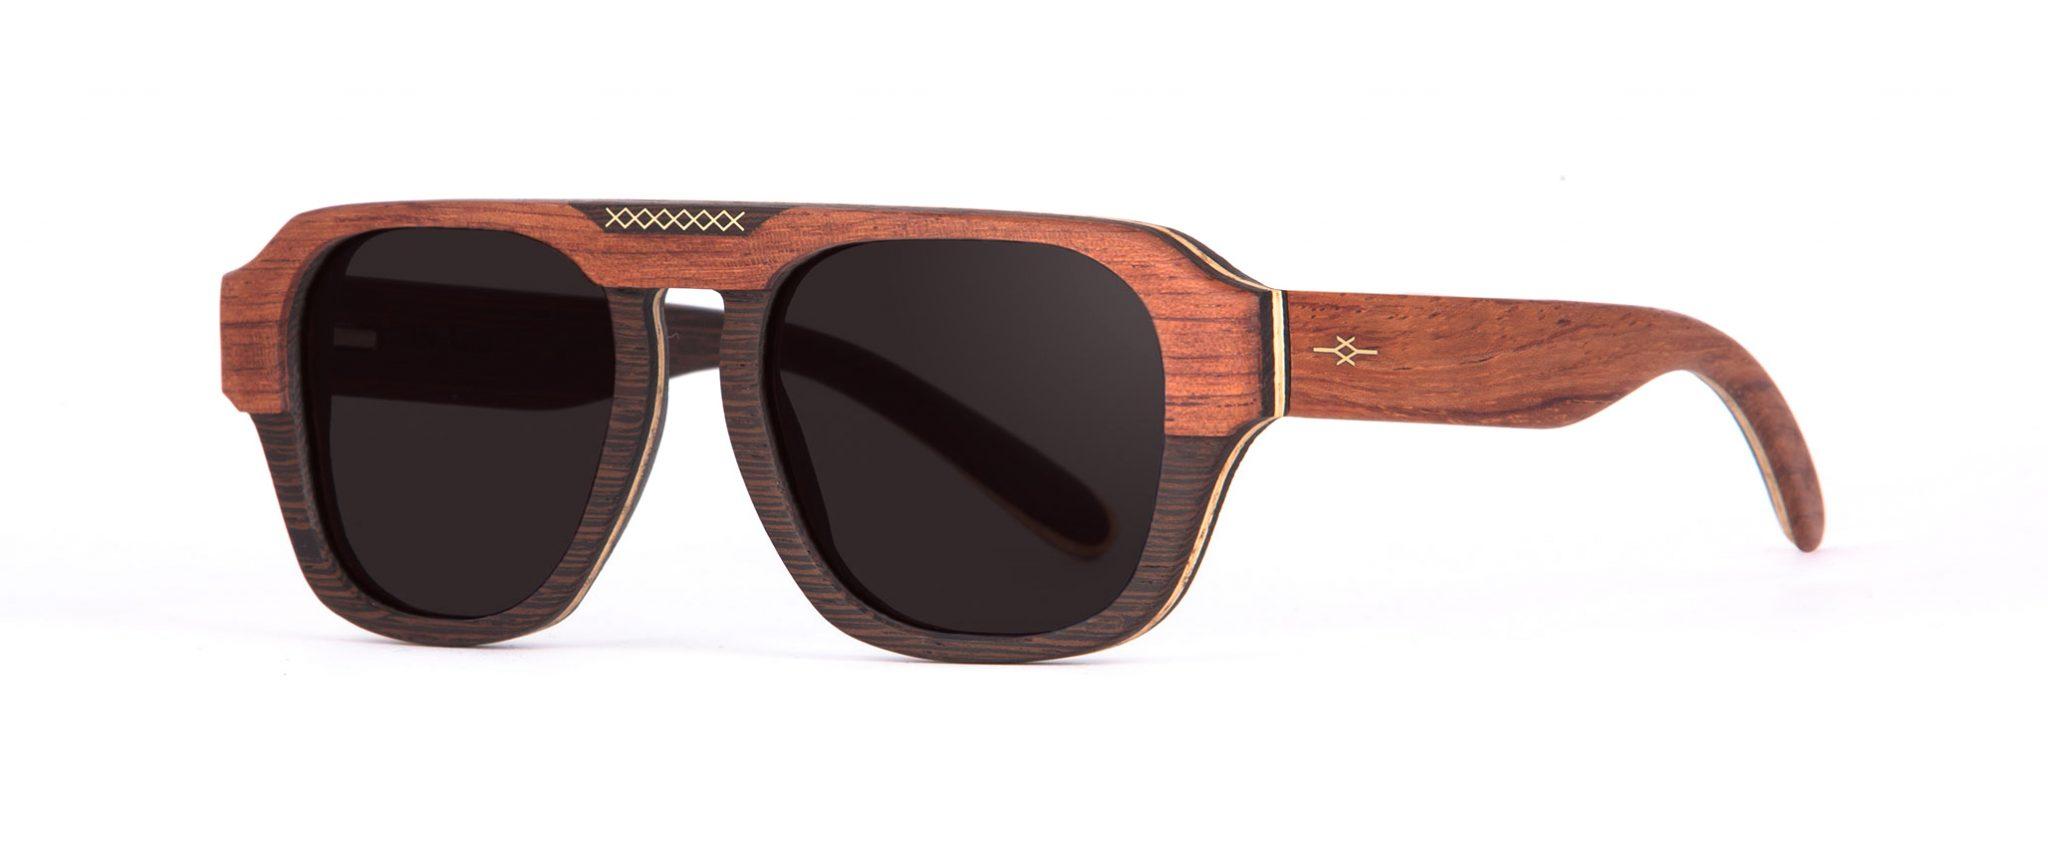 https://vakayeyewear.com/wp-content/uploads/2017/03/aberkane-side-wenge-bubenga-sunglasses-designer-eyewear.jpg